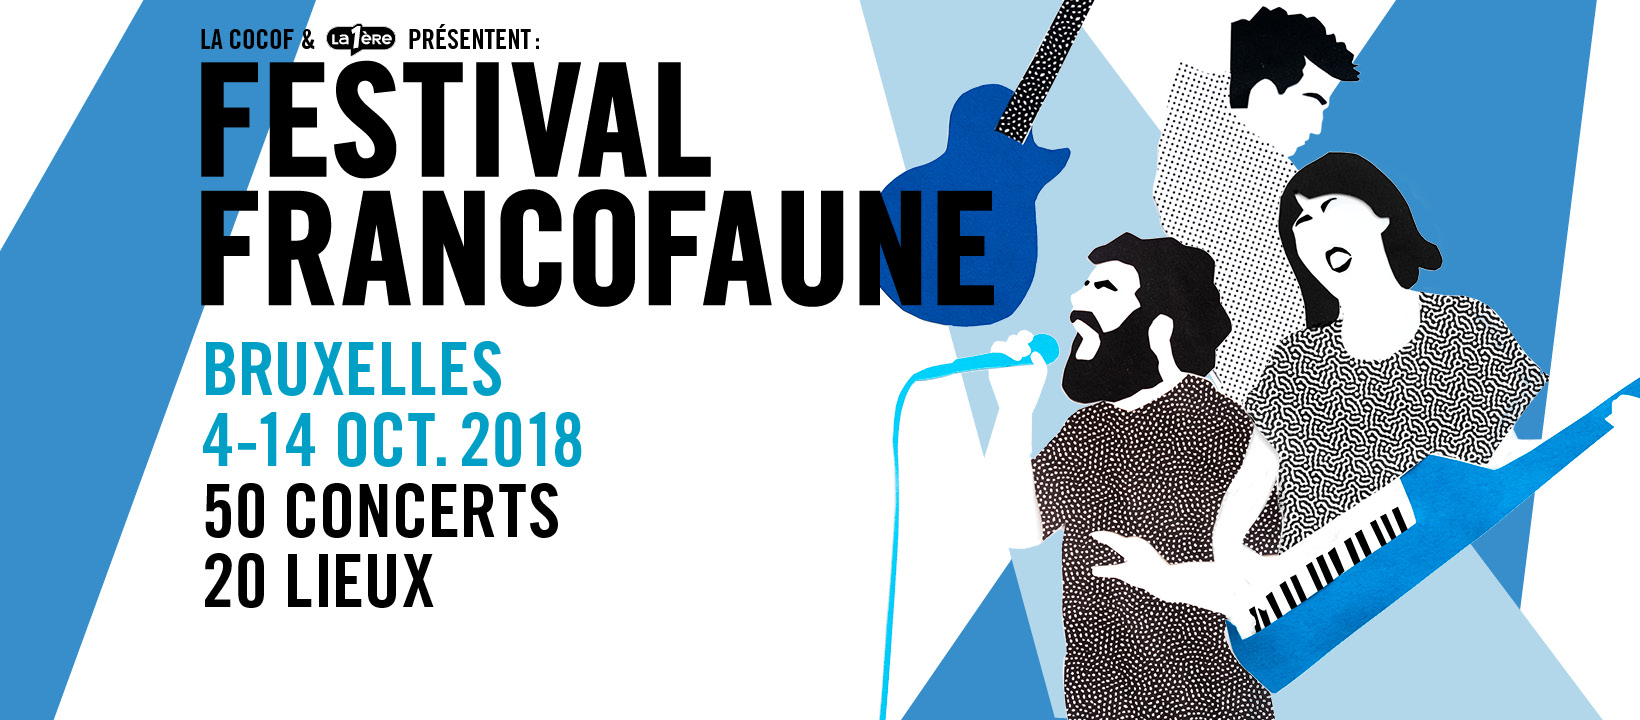 Festival FrancoFaune 2018